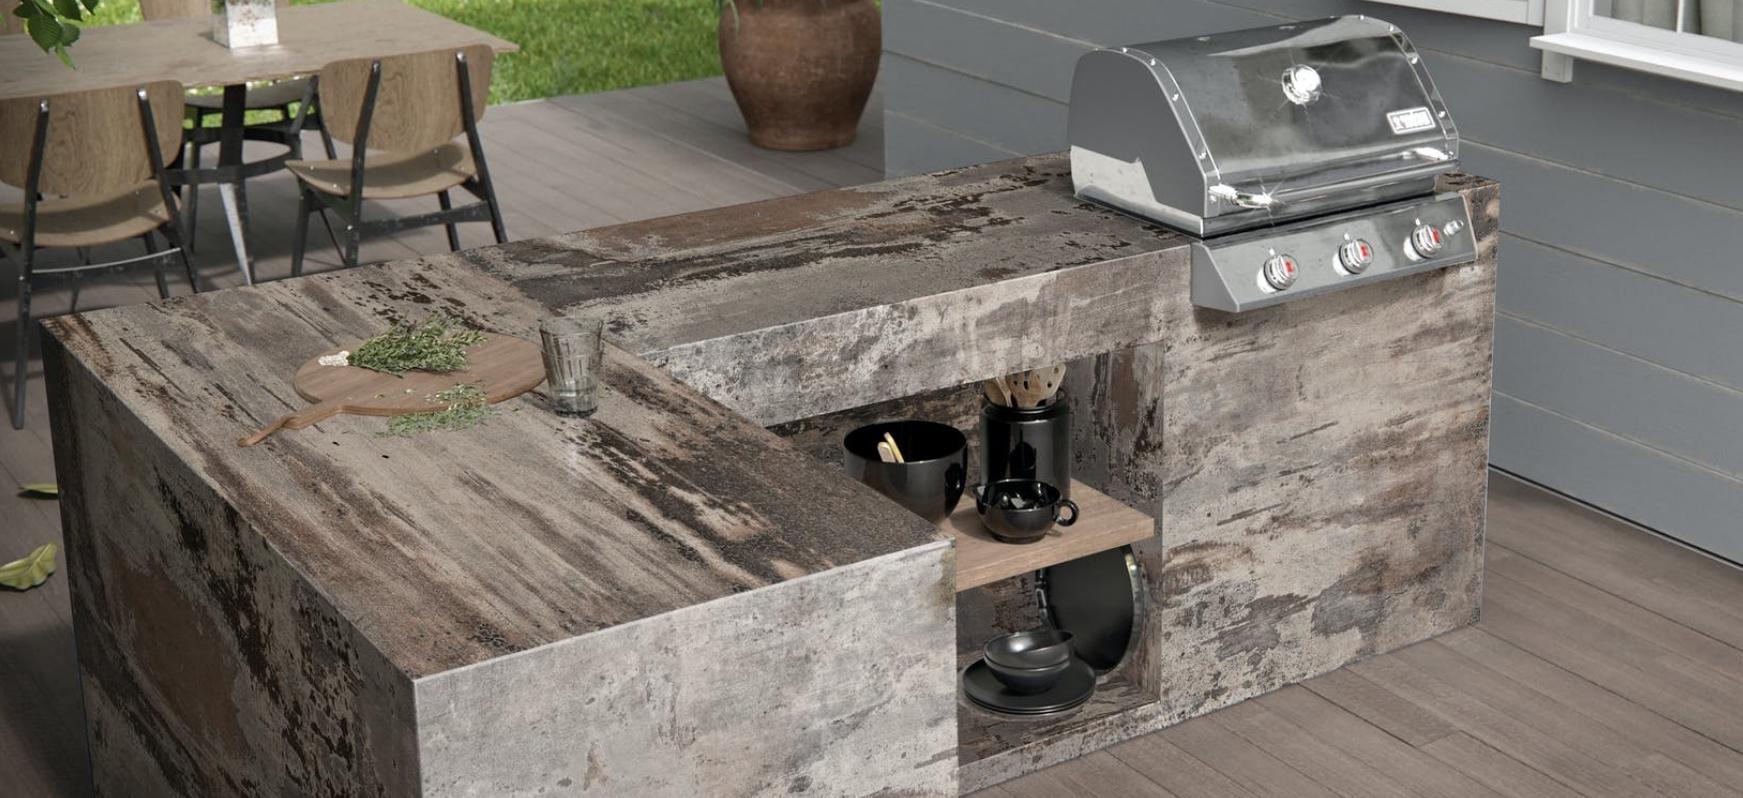 Drkton Trilium Outdoor Kitchen Countertops Natural Stone Countertops